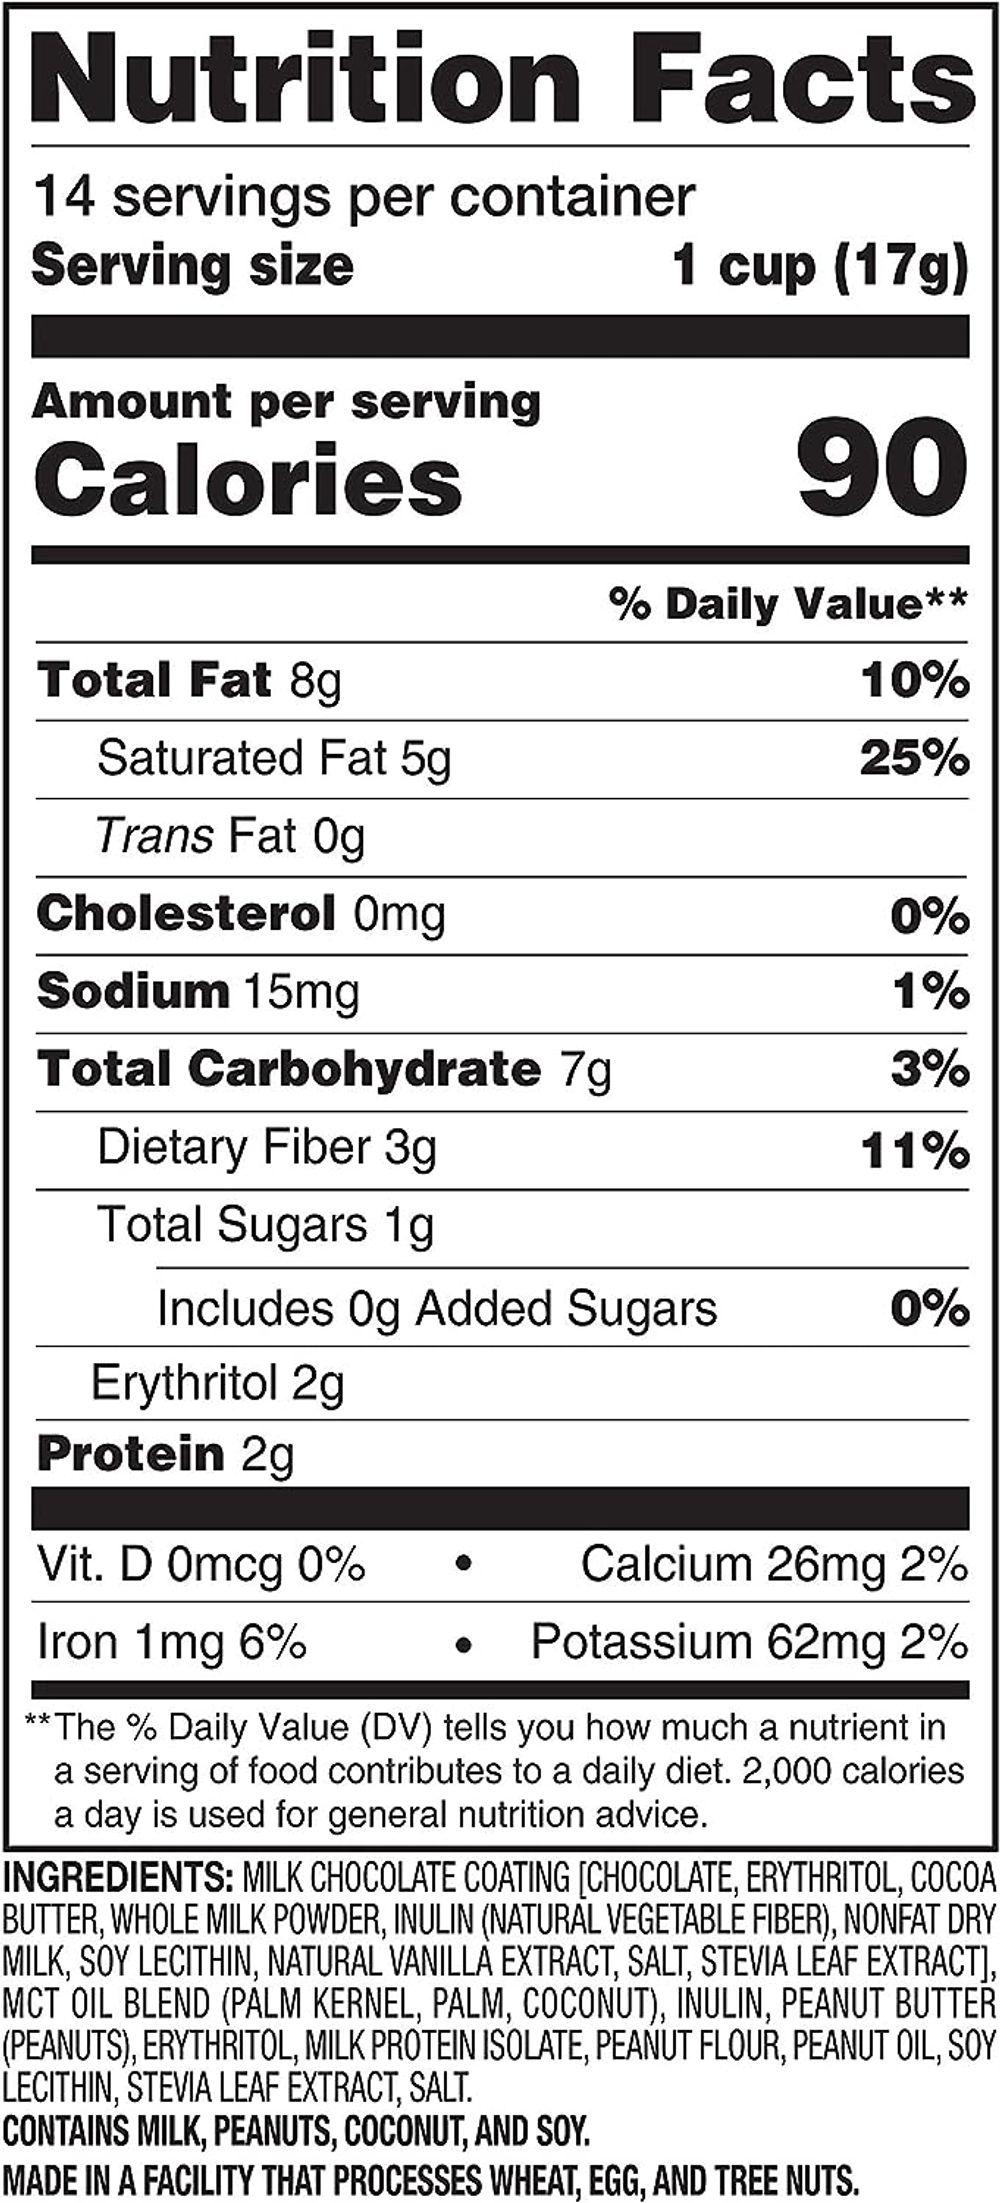 SlimFast Keto Fat Bomb Shot - Salted Caramel Crème - 10 Fl Oz - 10 Count - Pantry Friendly